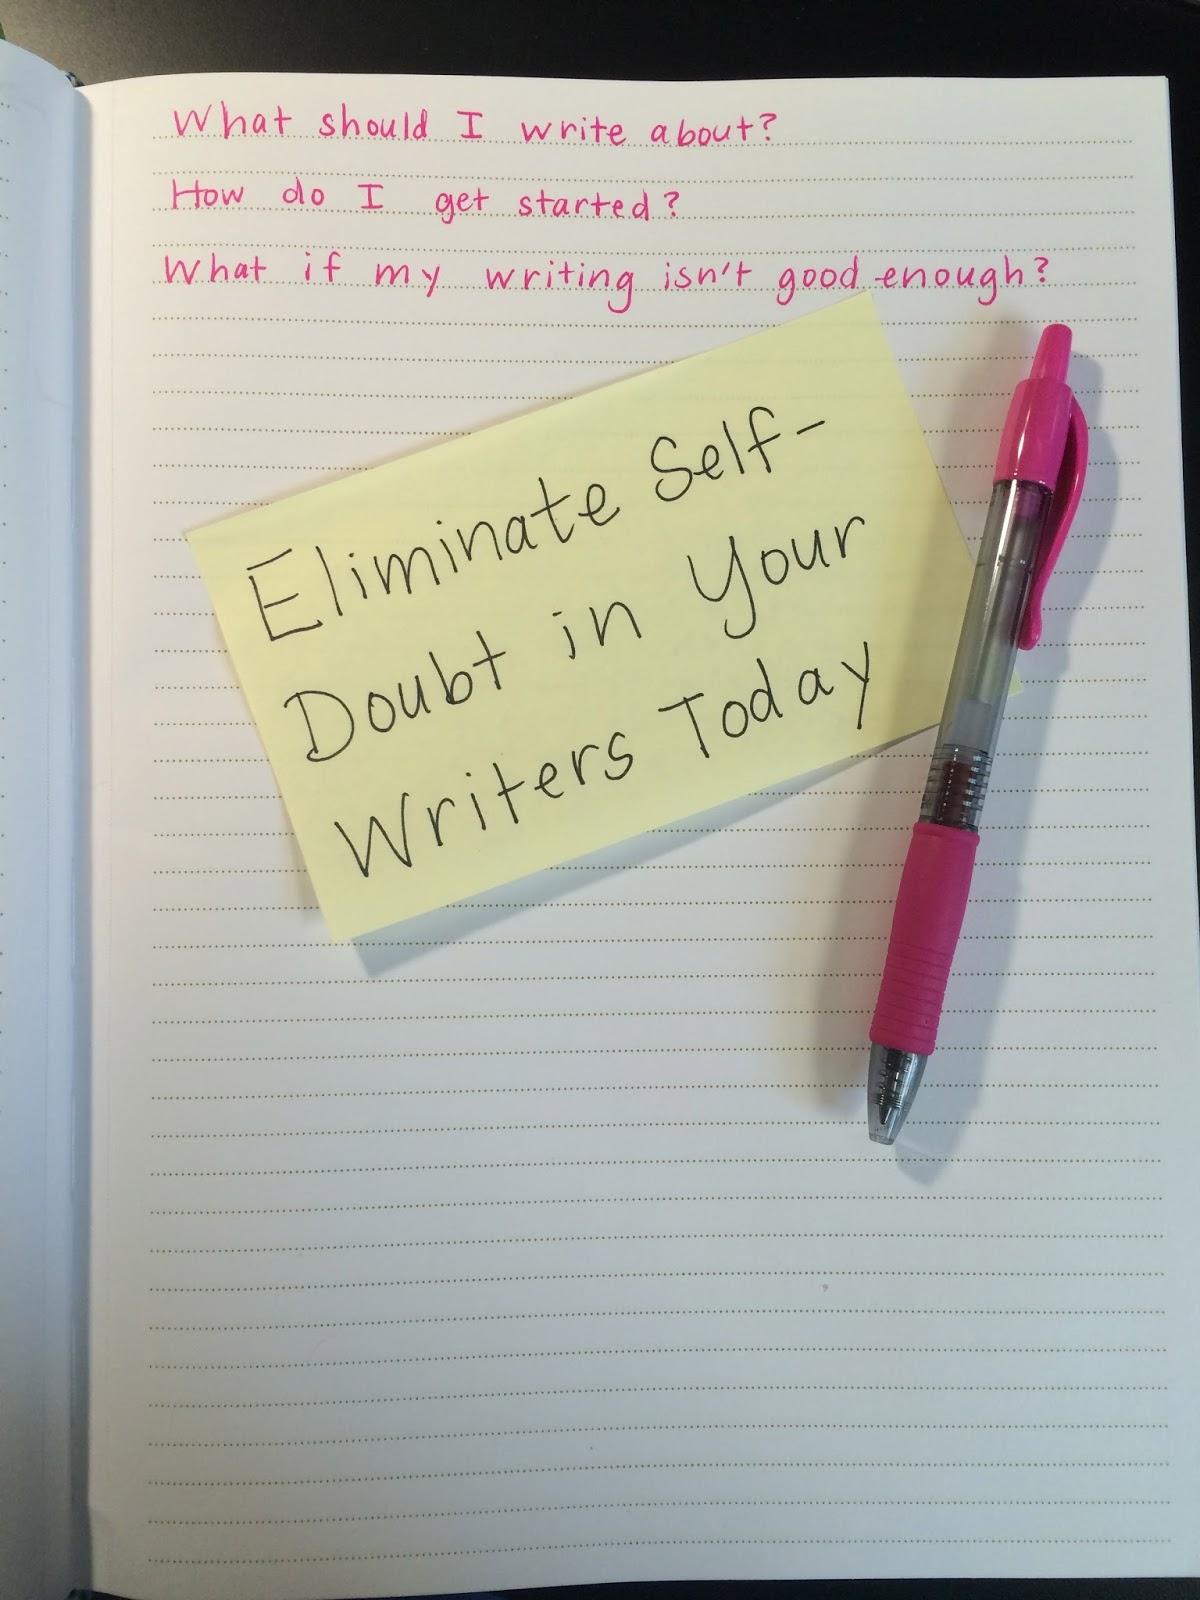 Assignment editor skills